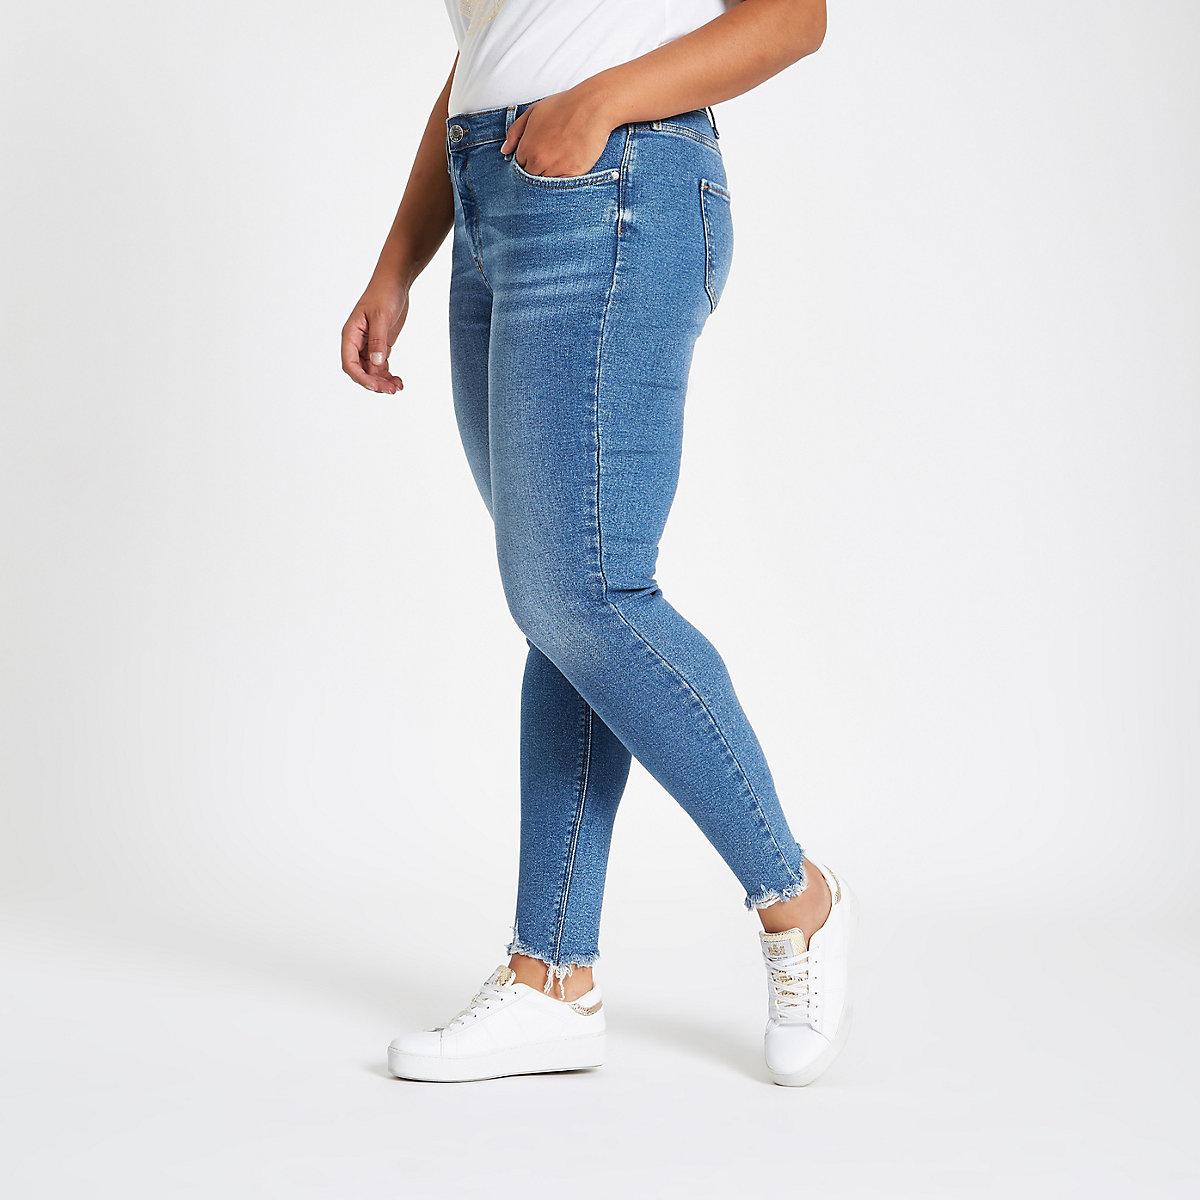 Plus – Amelie – Jean skinny bleu moyen taille mi-haute